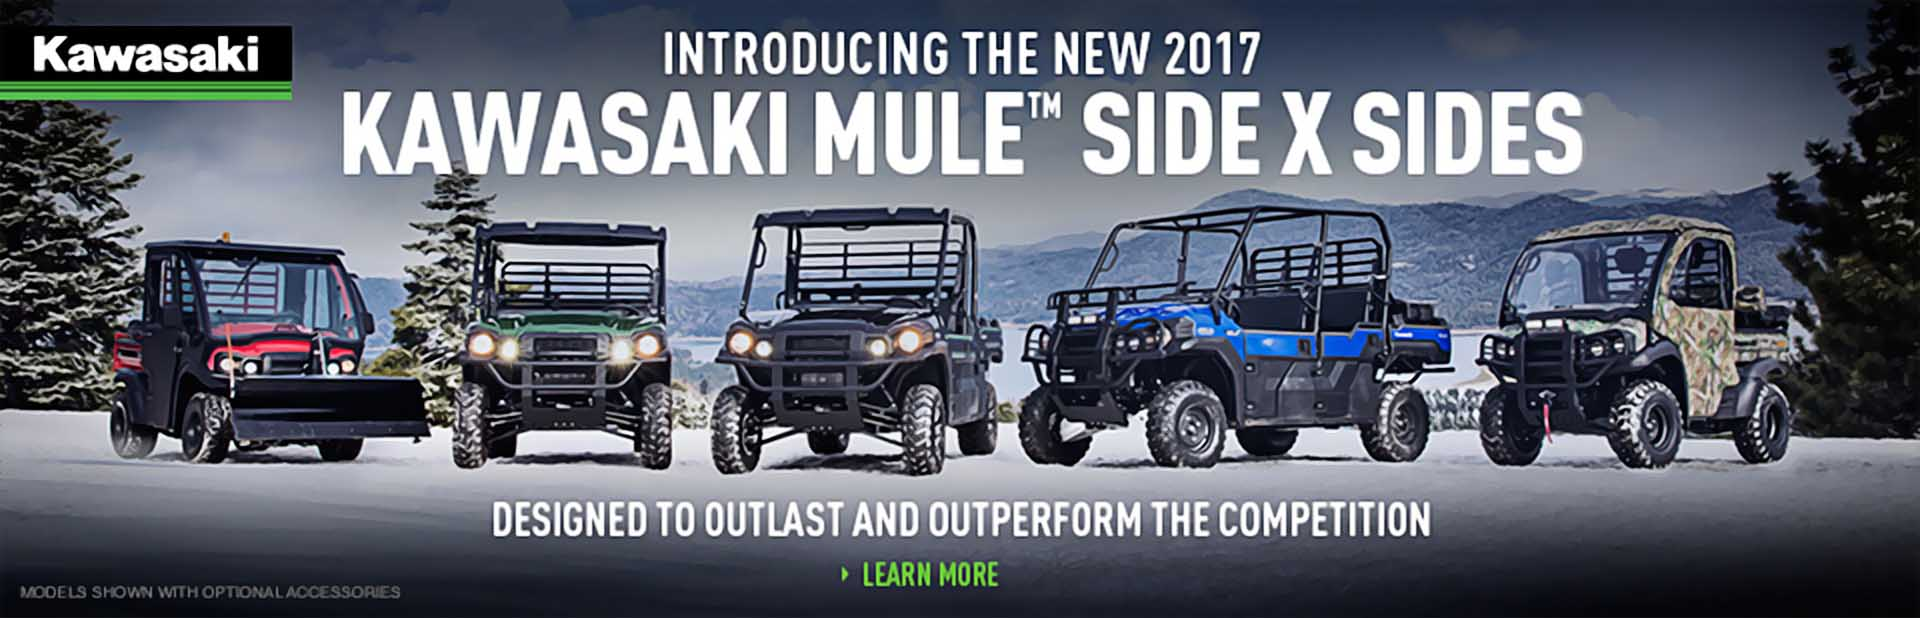 2017 Kawasaki Mule Side x Sides